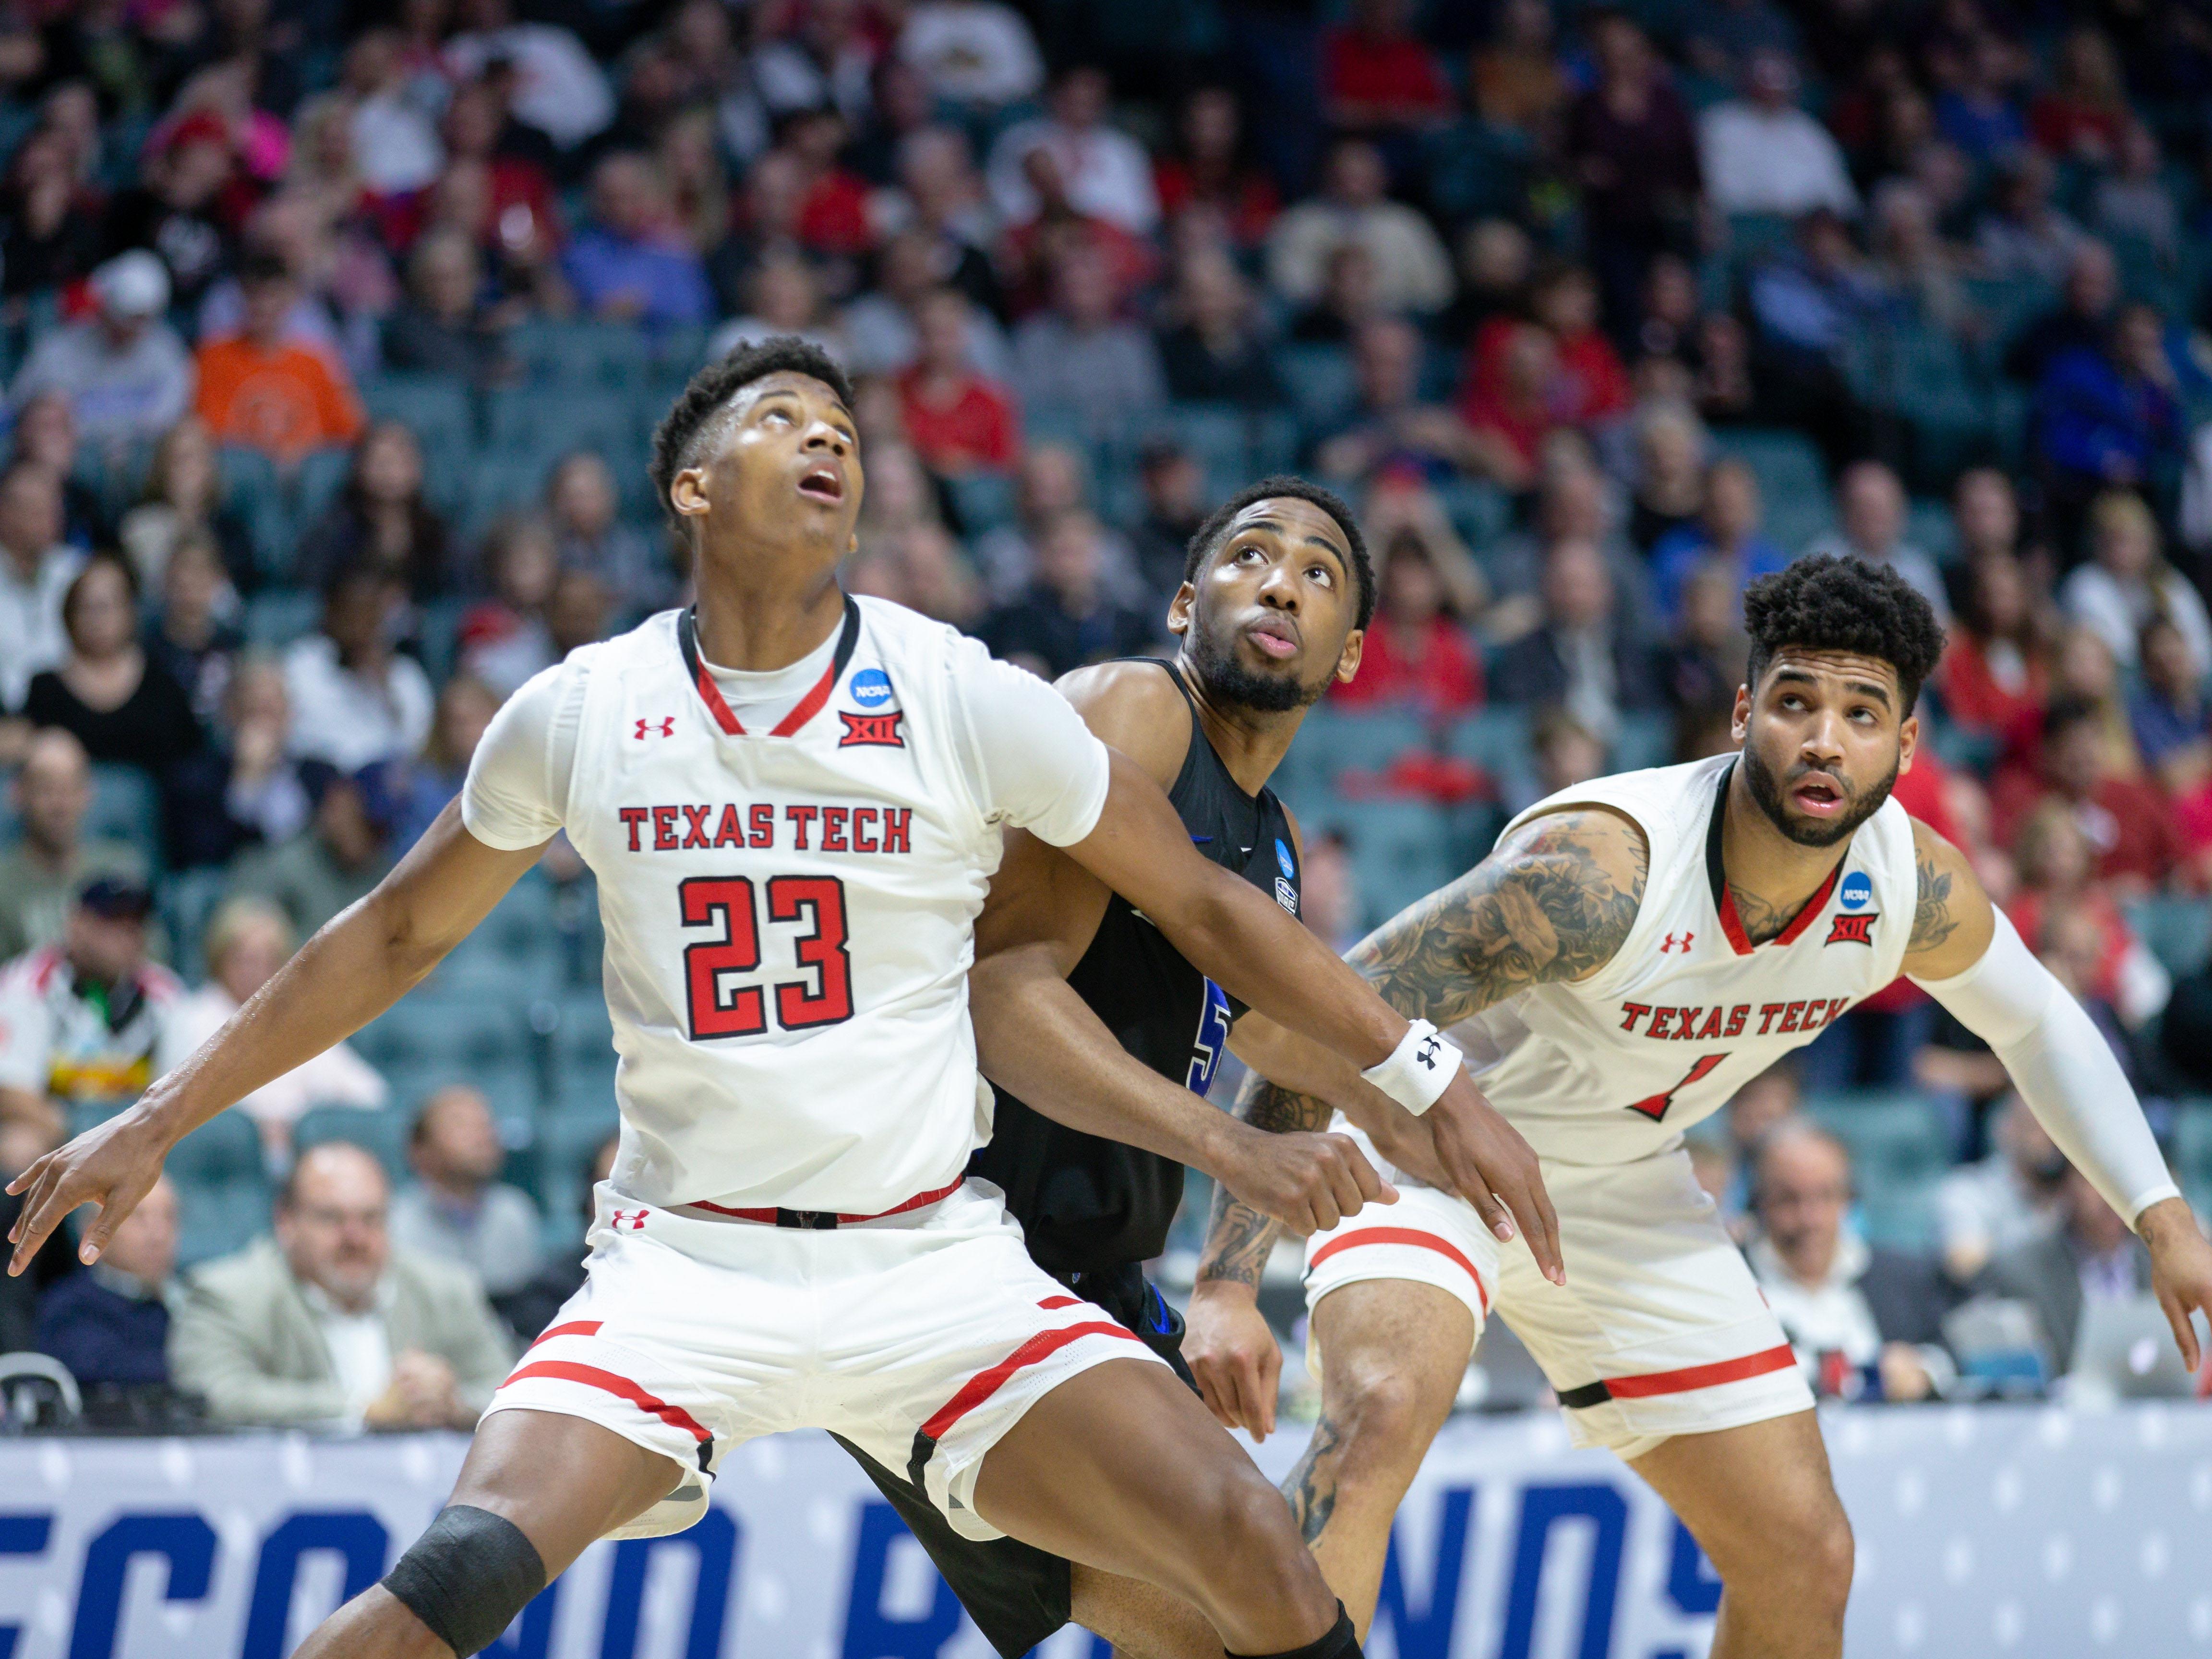 NCAA BASKETBALL: MAR 24 Div I Men's Championship - Second Round - Texas Tech v Buffalo